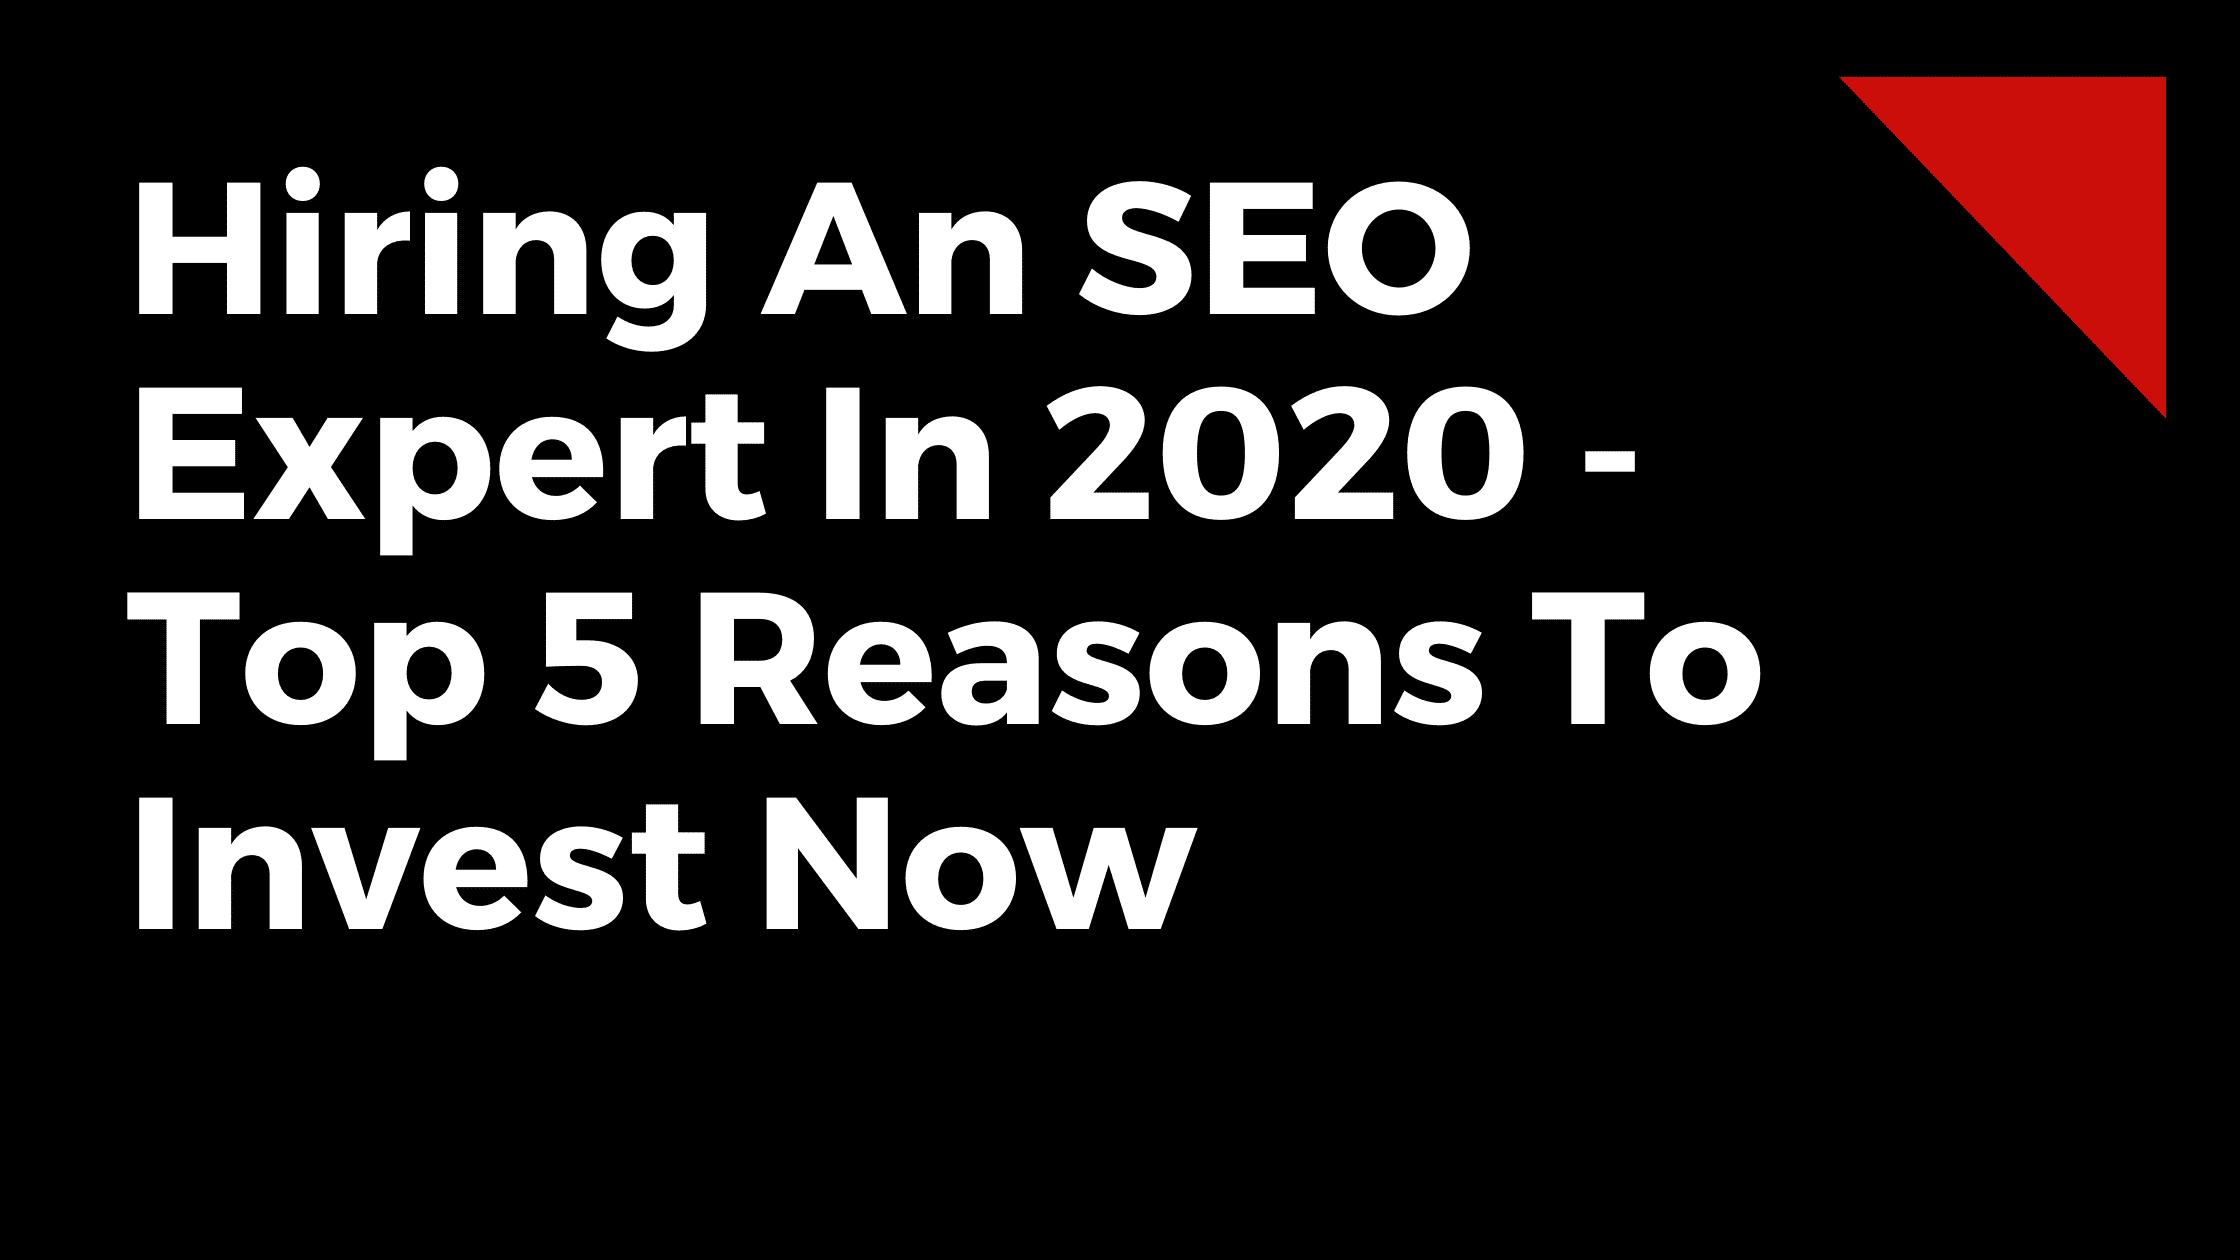 Marvel Marketing - Calgary Digital Marketing Agency Hiring-An-SEO-Expert-In-2020-Blog-Post Blog